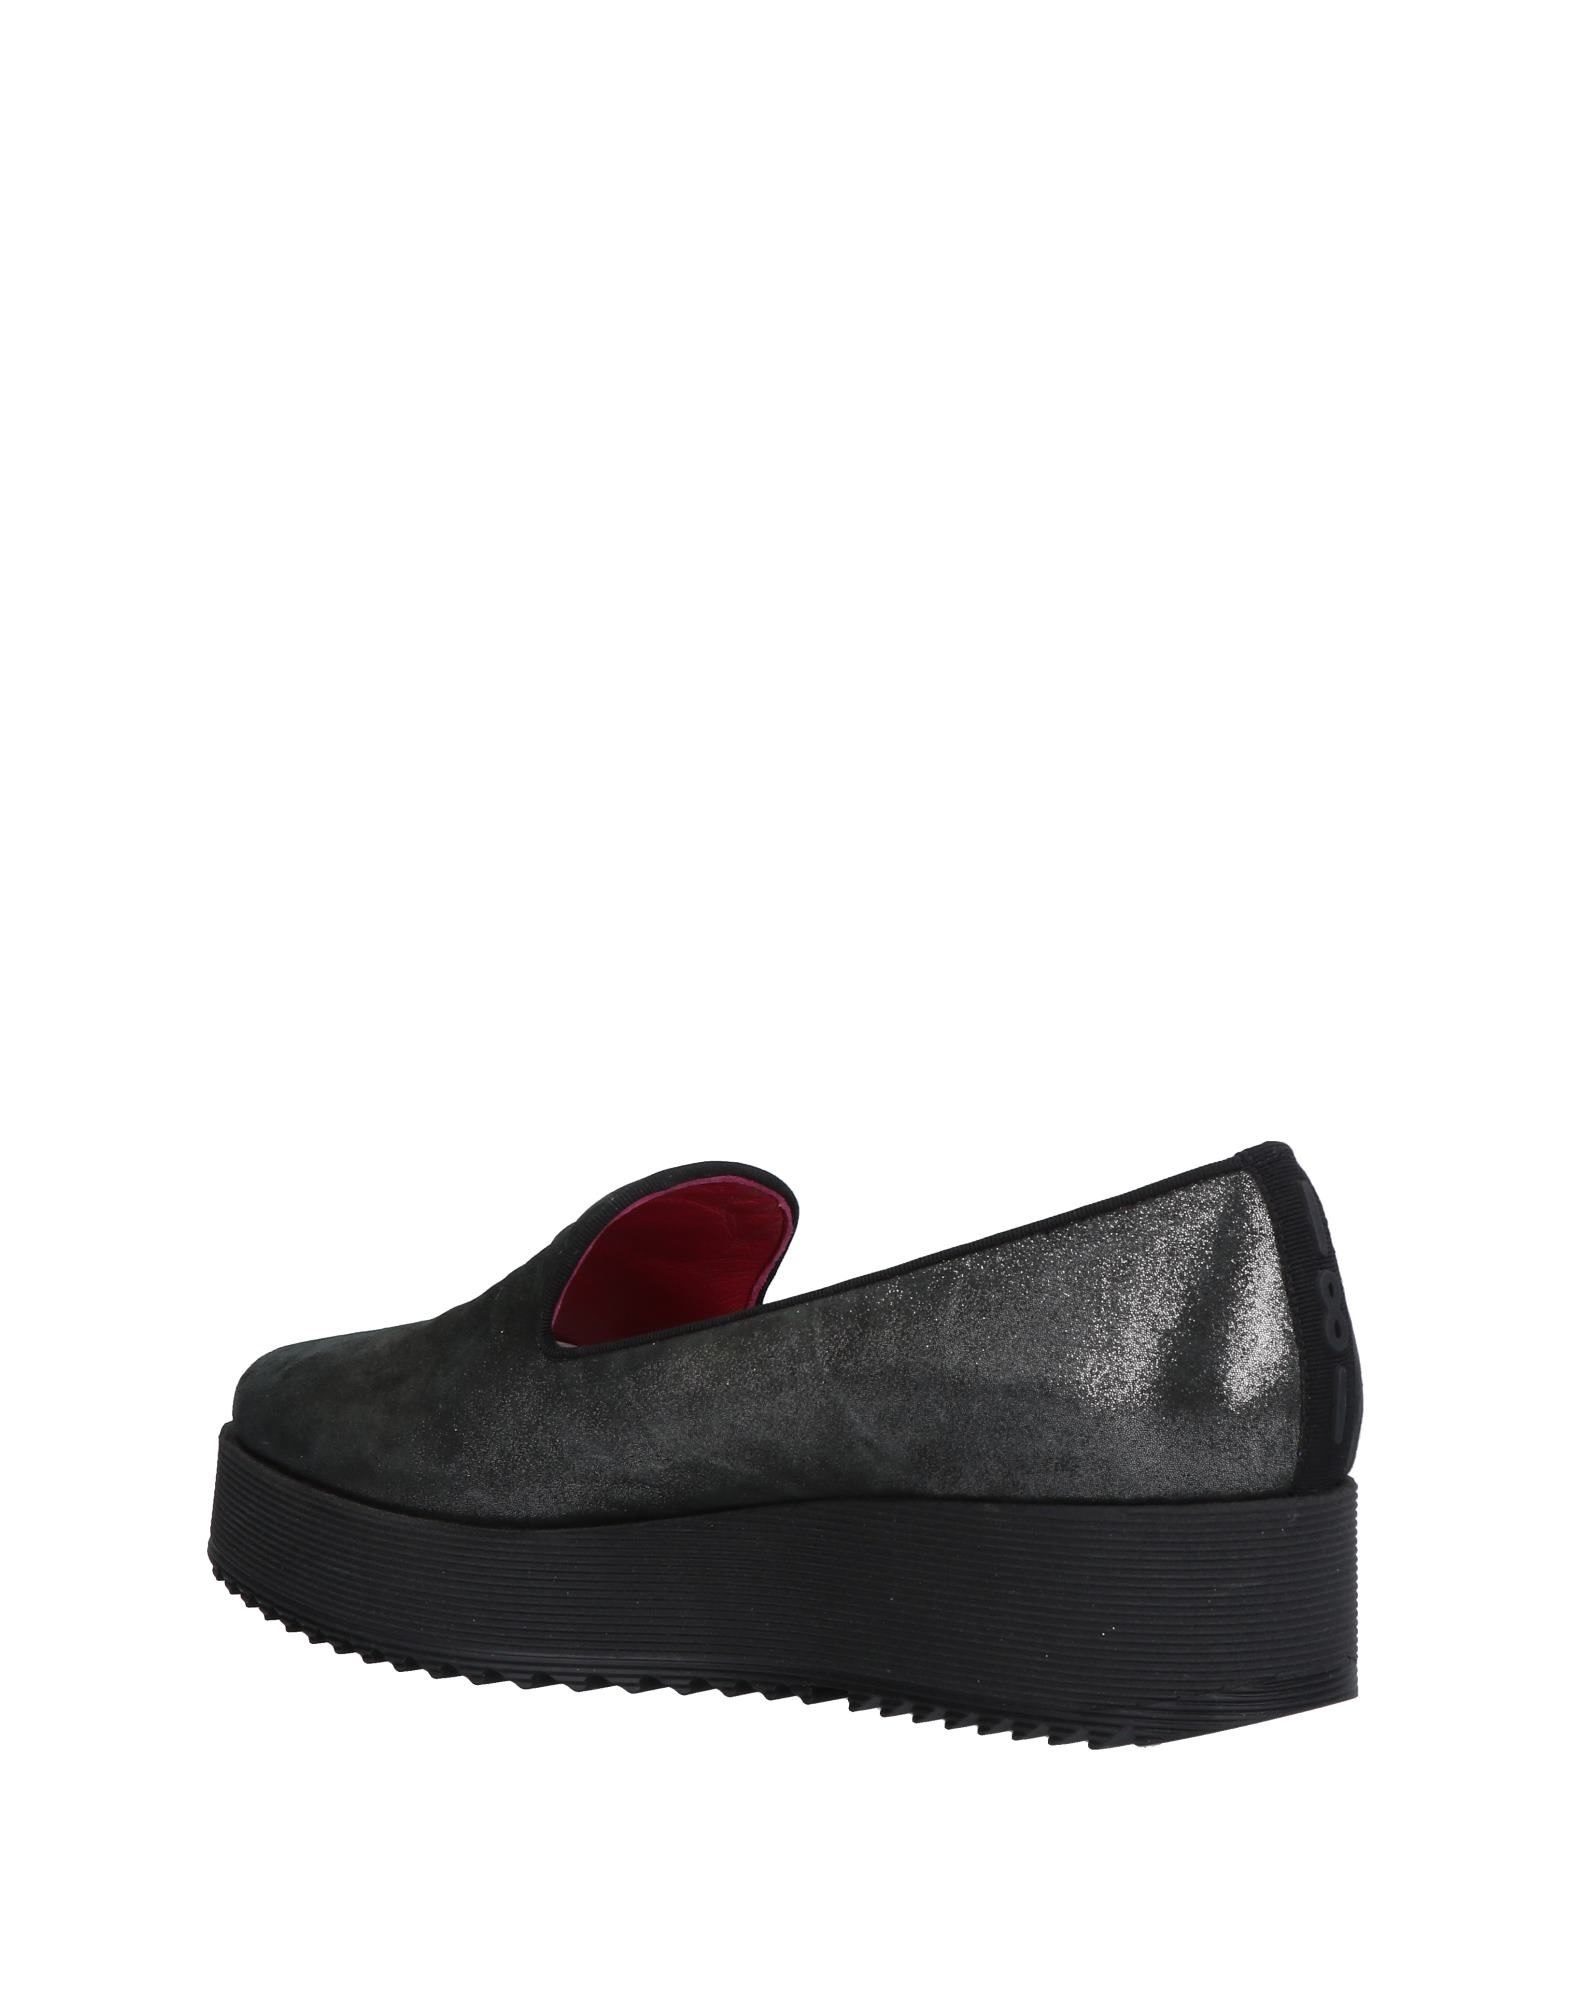 Stilvolle Gozzi billige Schuhe 181 By Alberto Gozzi Stilvolle Pumps Damen  11471669OD 65700f